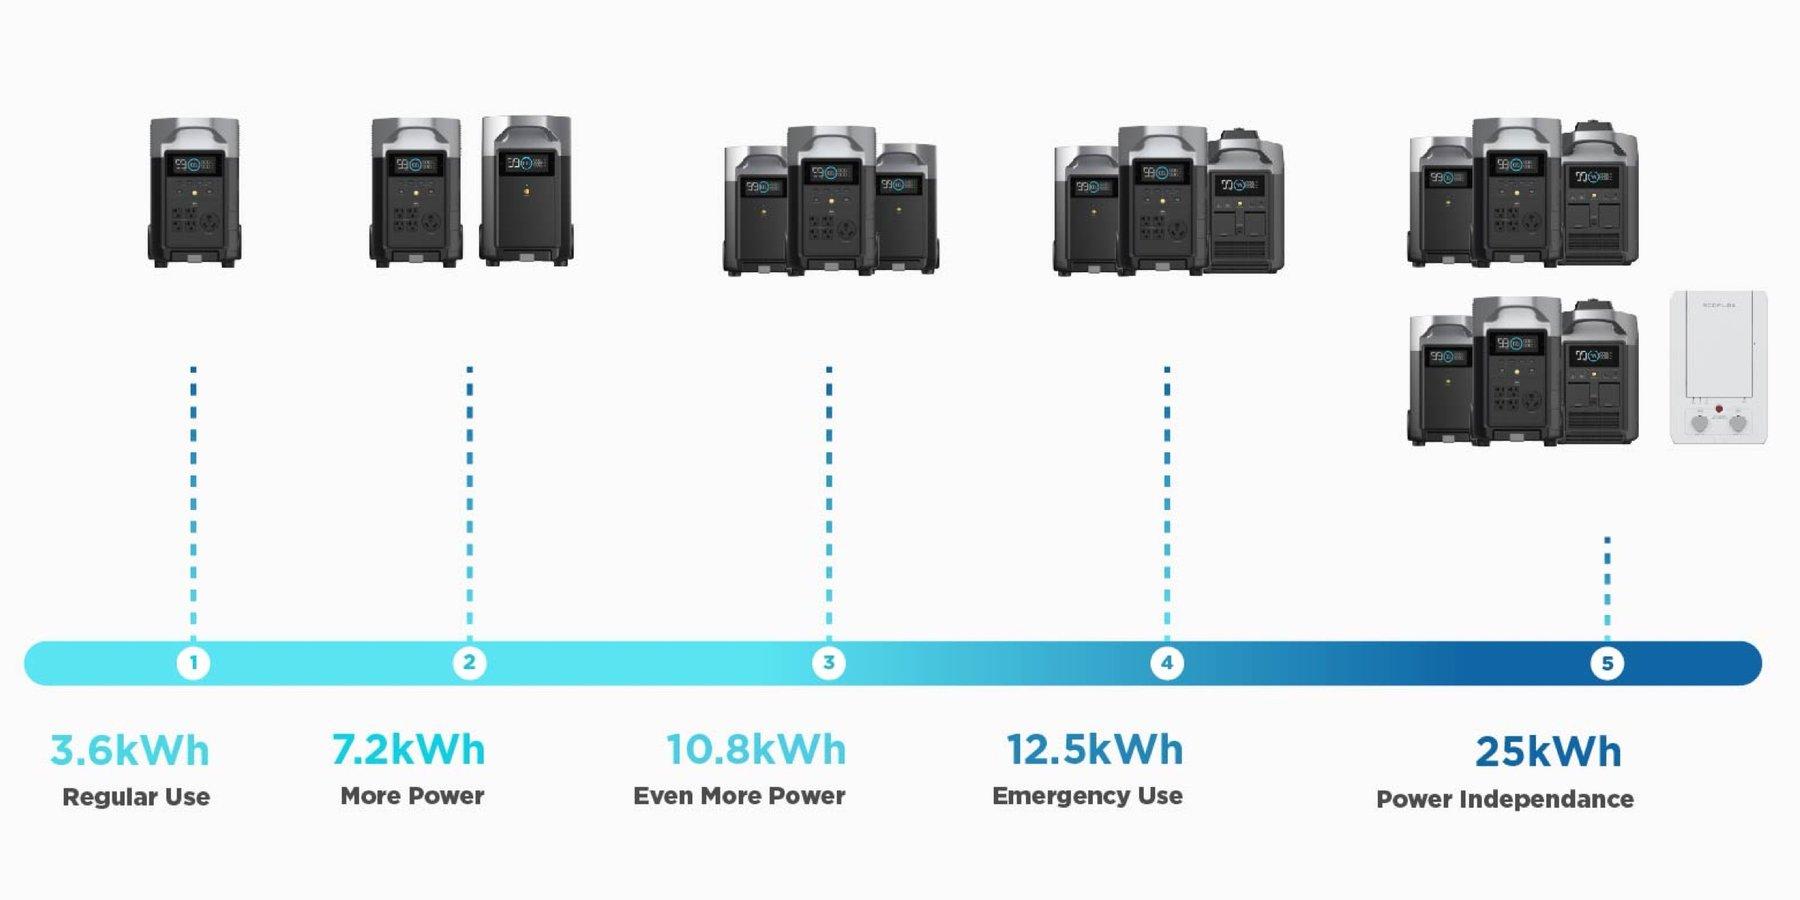 Ecoflow delta pro alimentation autonome 25KW